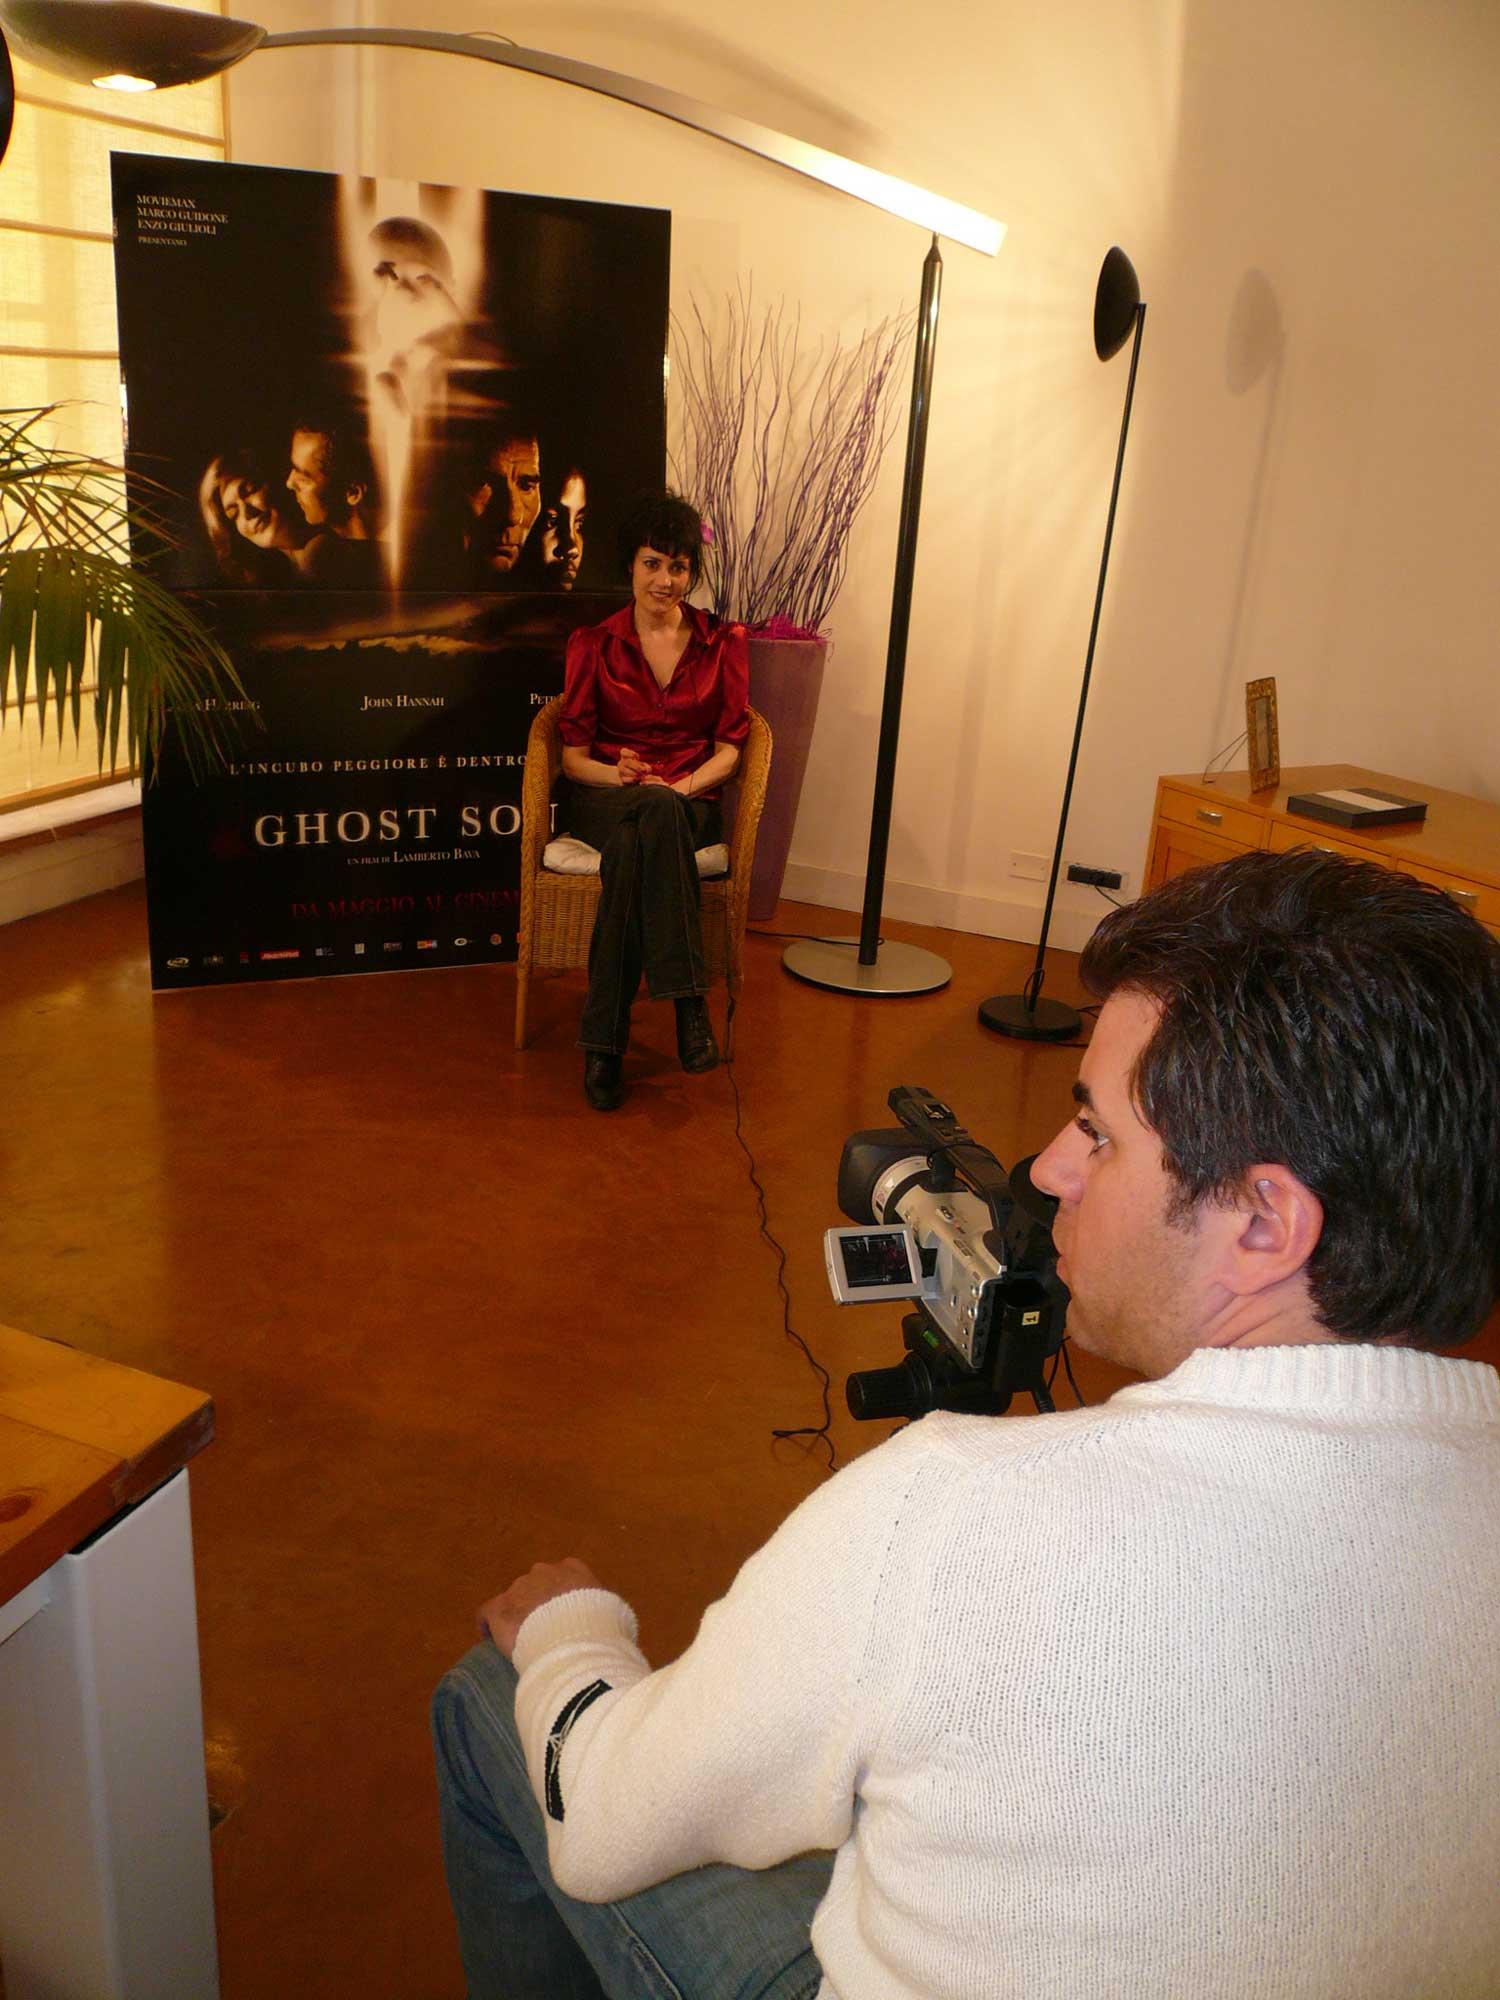 Coralina Cataldi-Tassoni for GHOST SON'S DVD bonus features interview